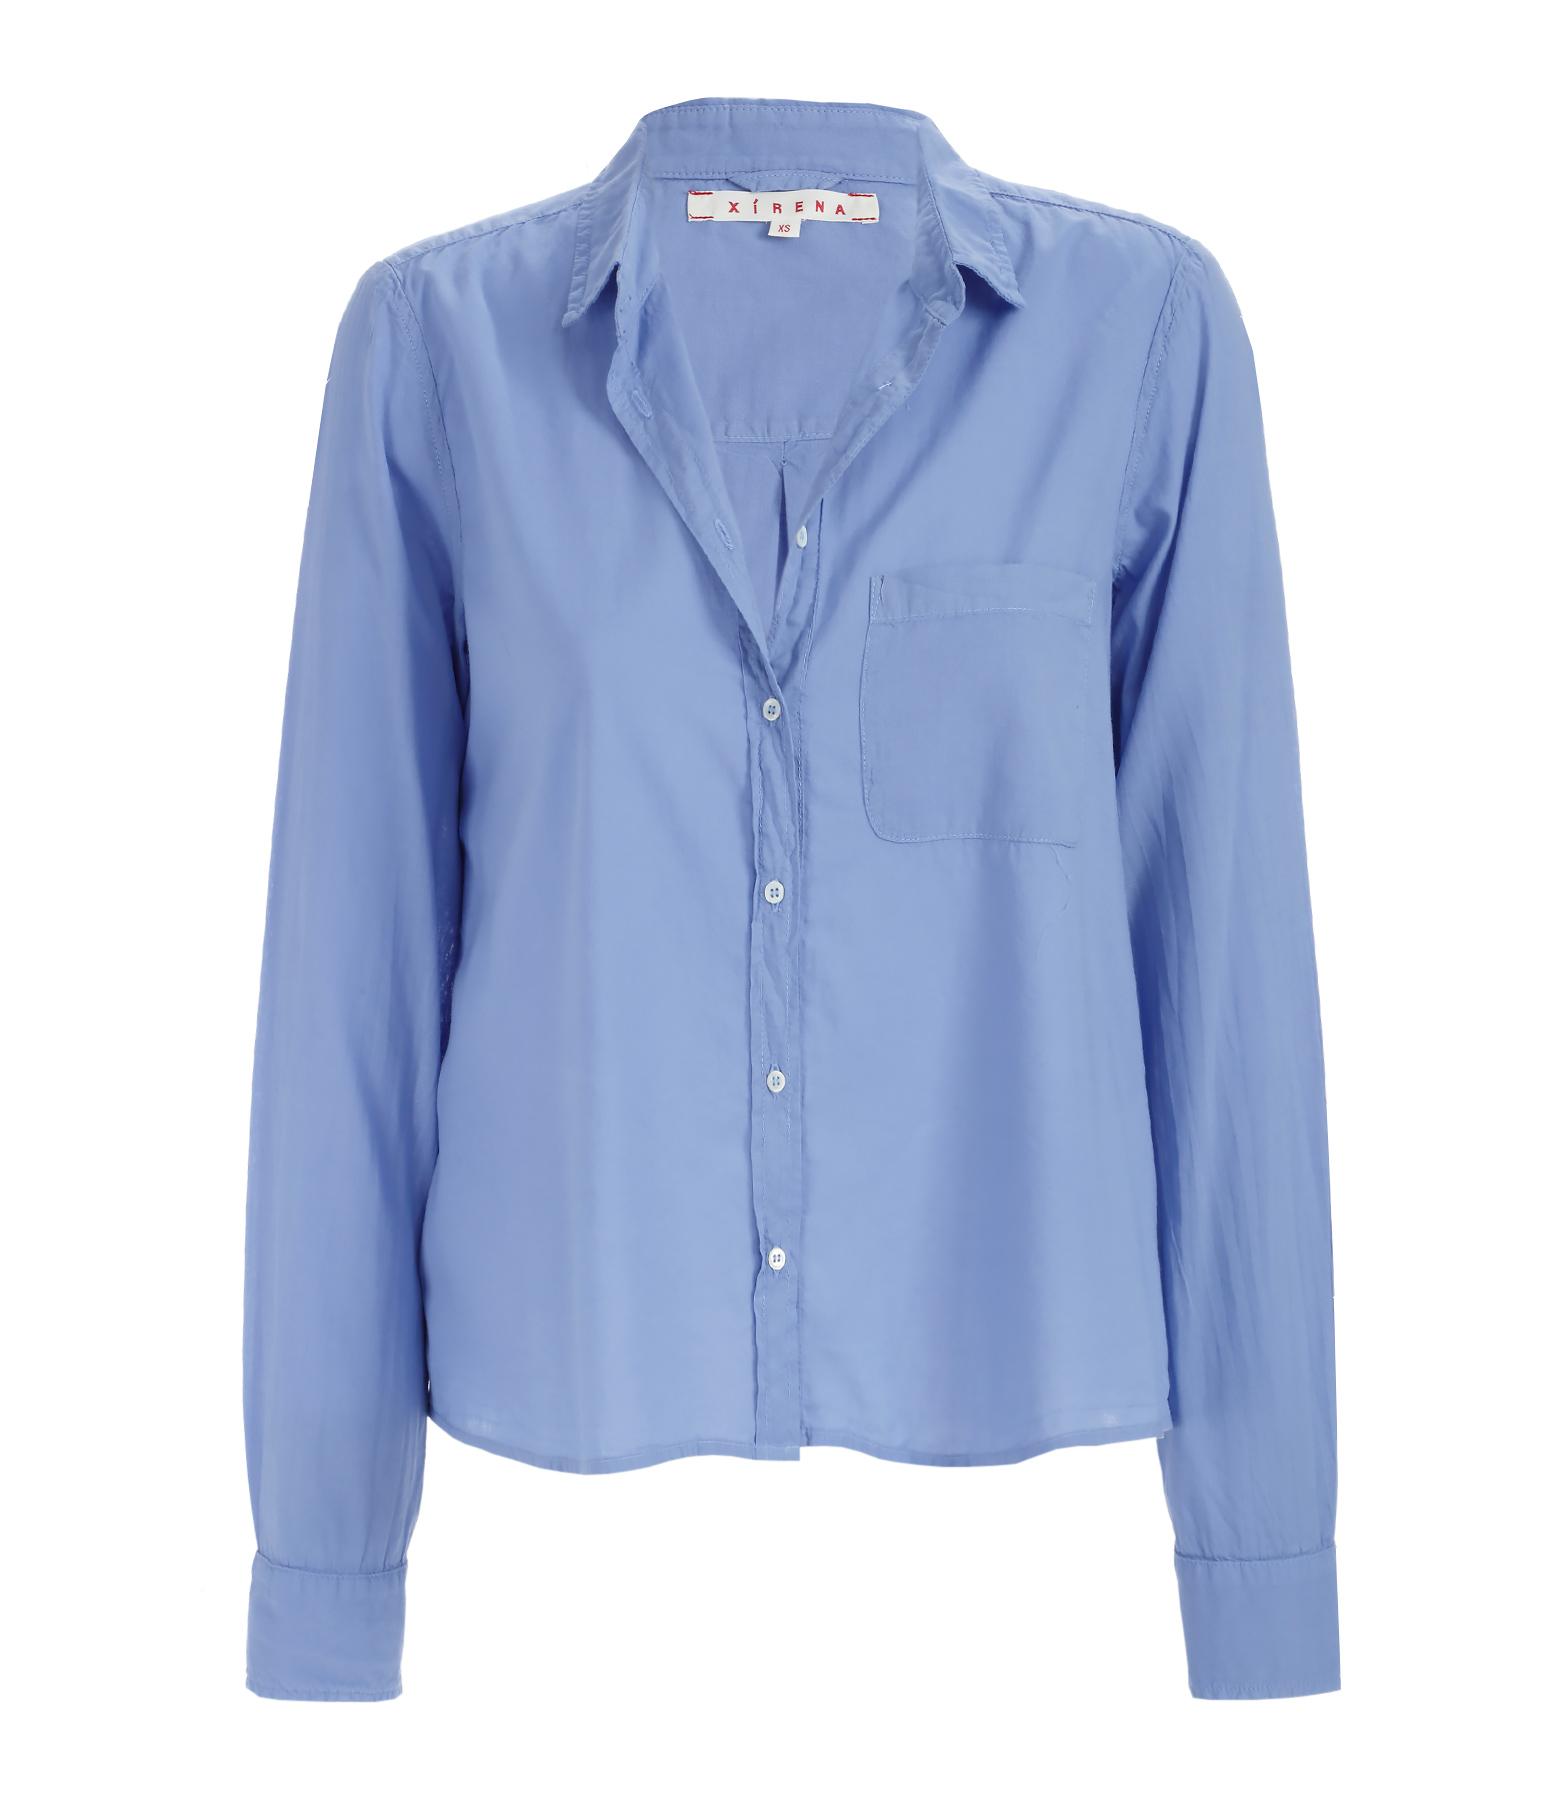 Chemise Cotton Poplin Easton Coton Voyage Bleu